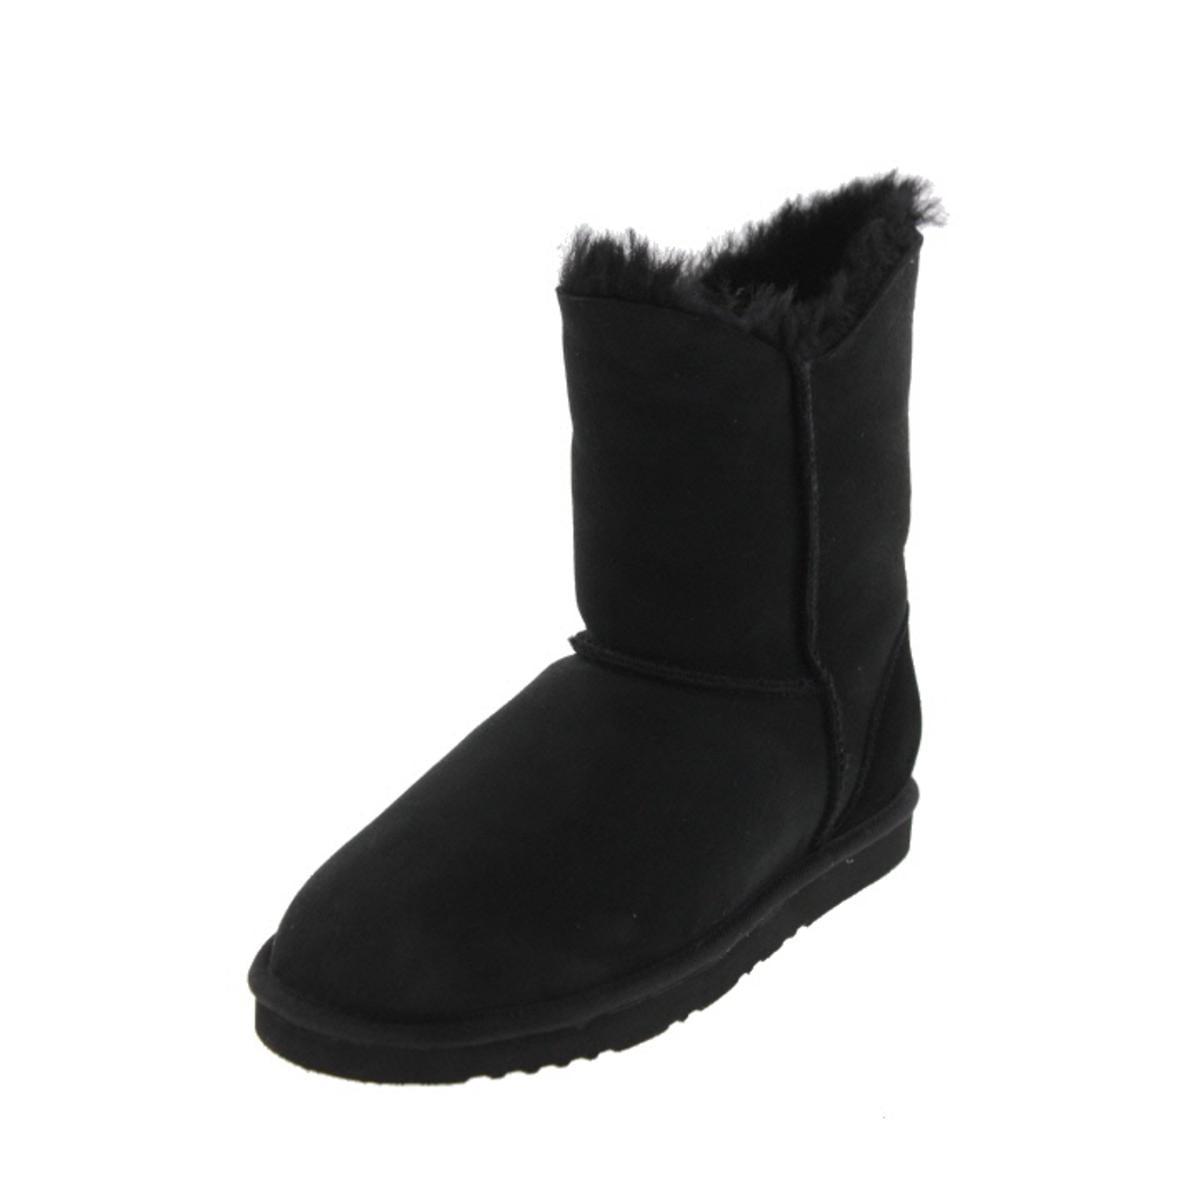 Koolaburra Womens Double Halo Short Sheepskin Lined Ankle Boots by Koolaburra